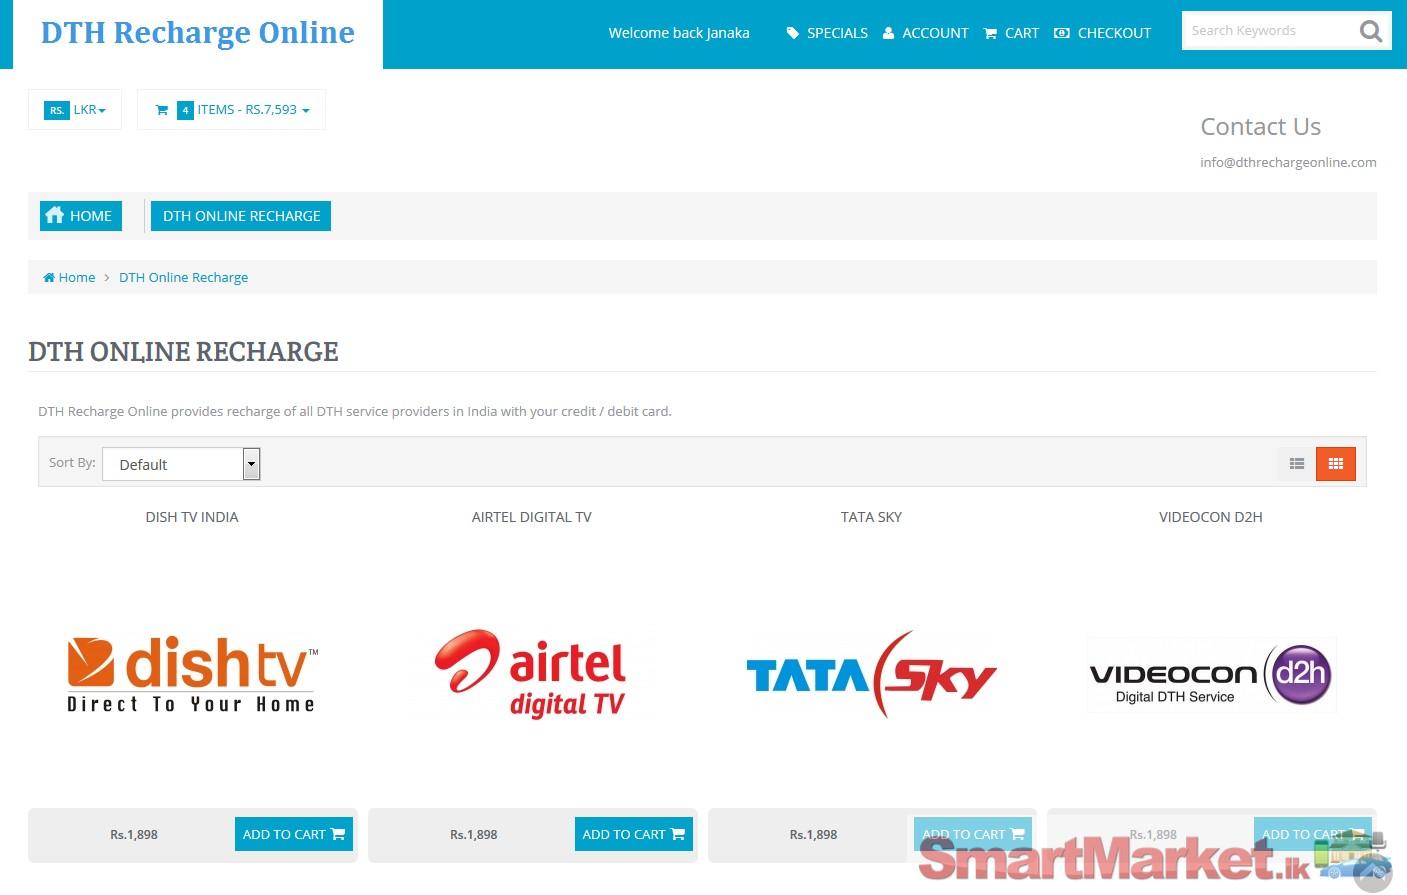 Dish TV | Videocon d2h | Sun Direct Recharge in Sri Lanka